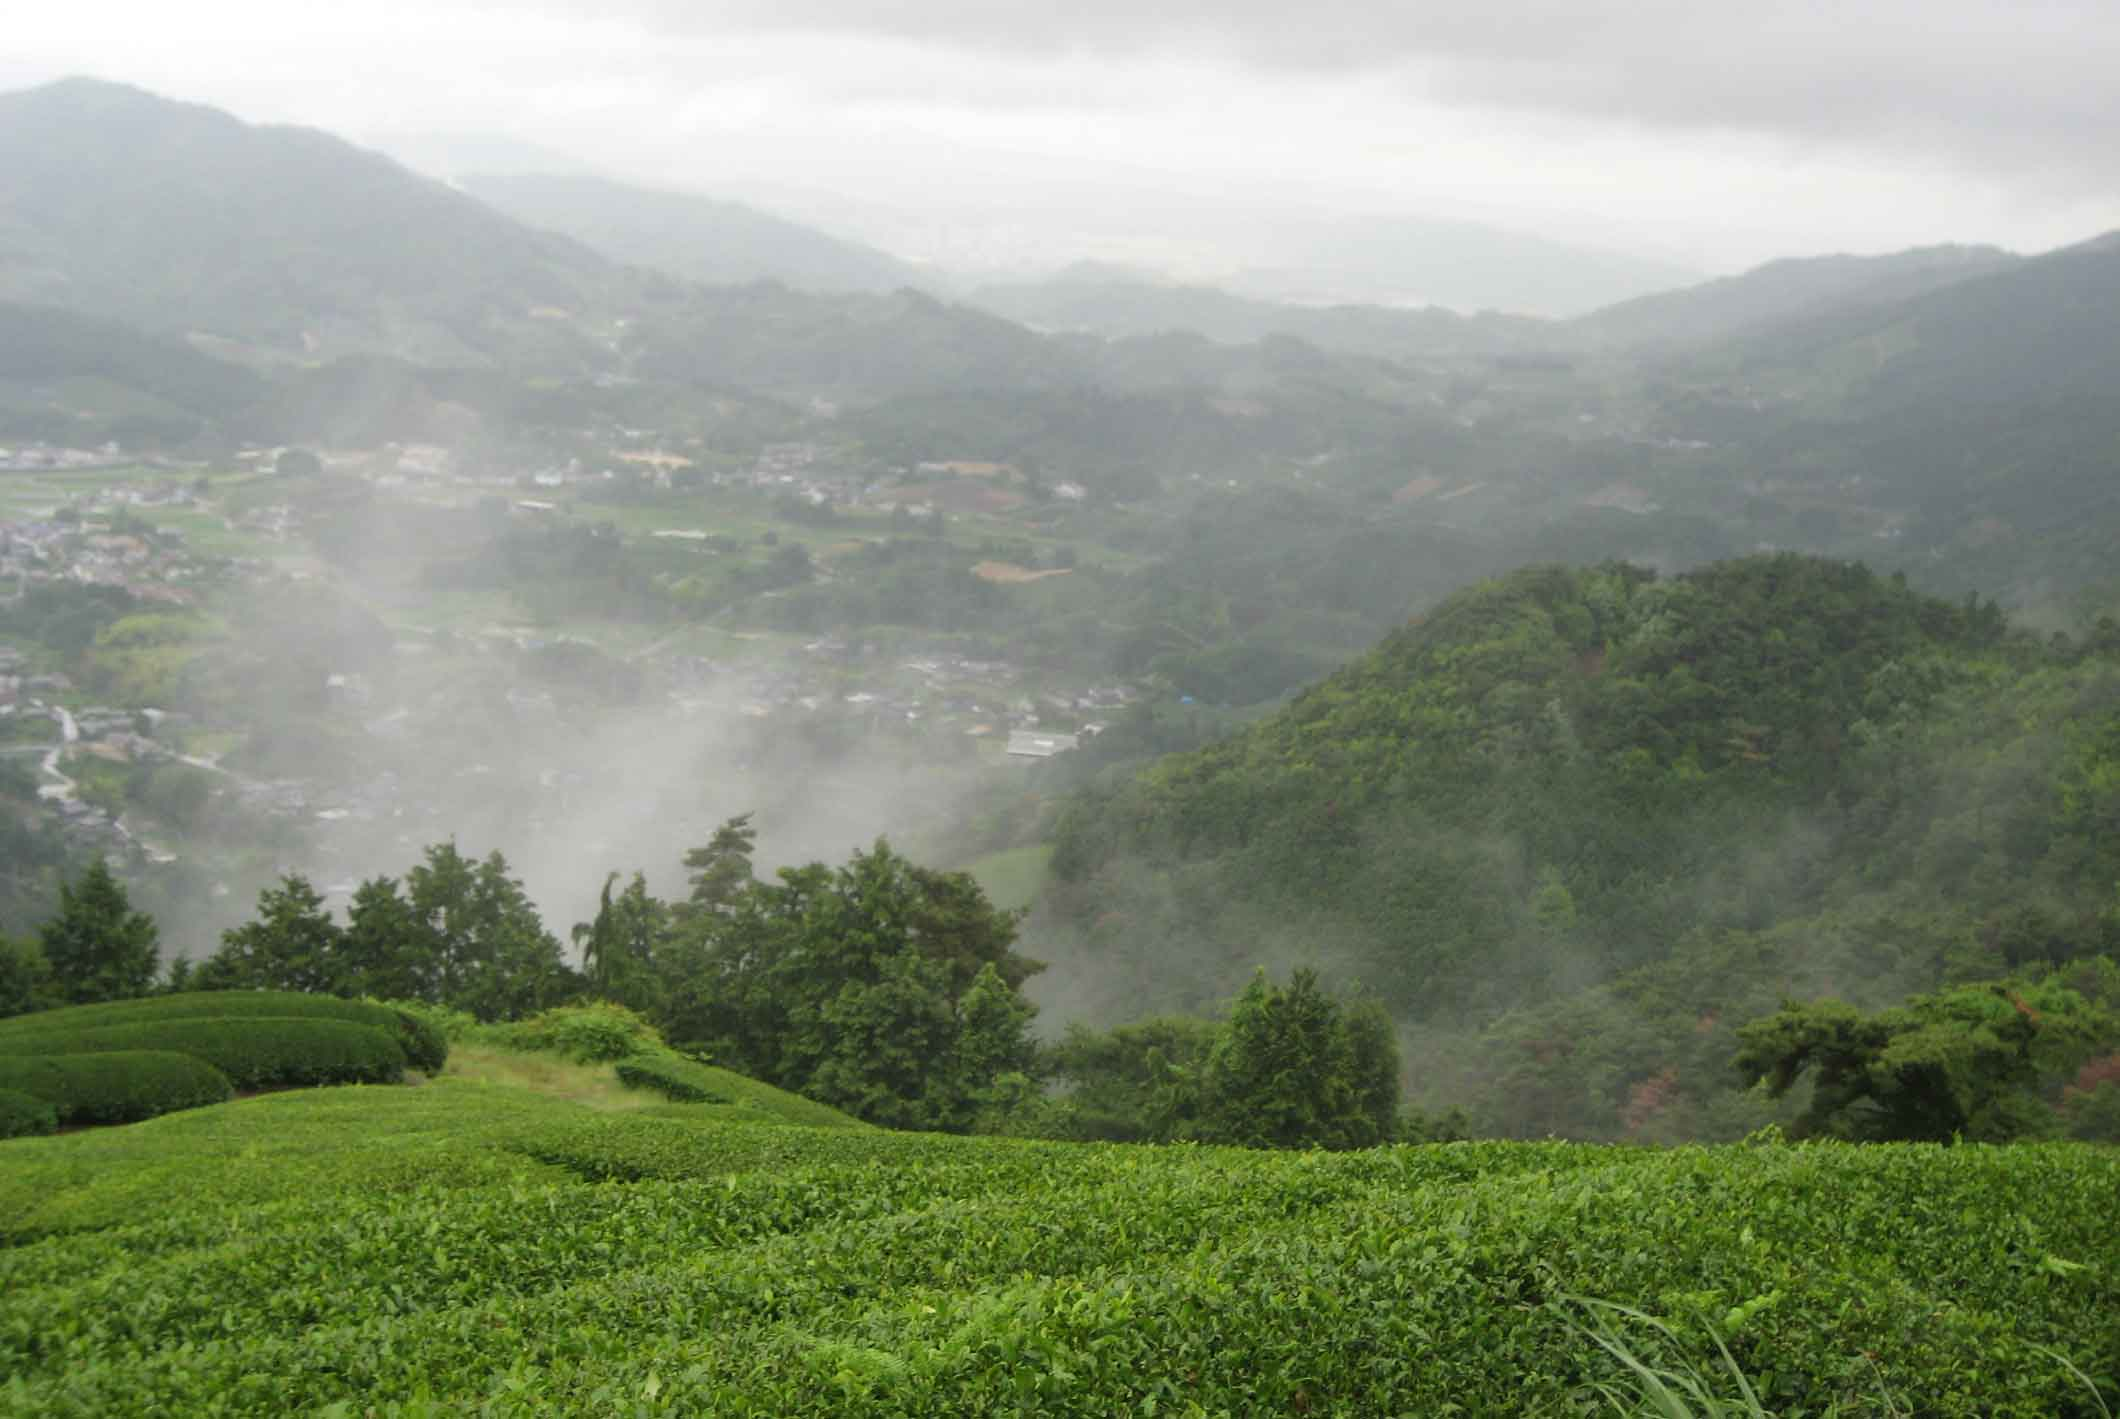 Shizouka Tea Fields, Japan